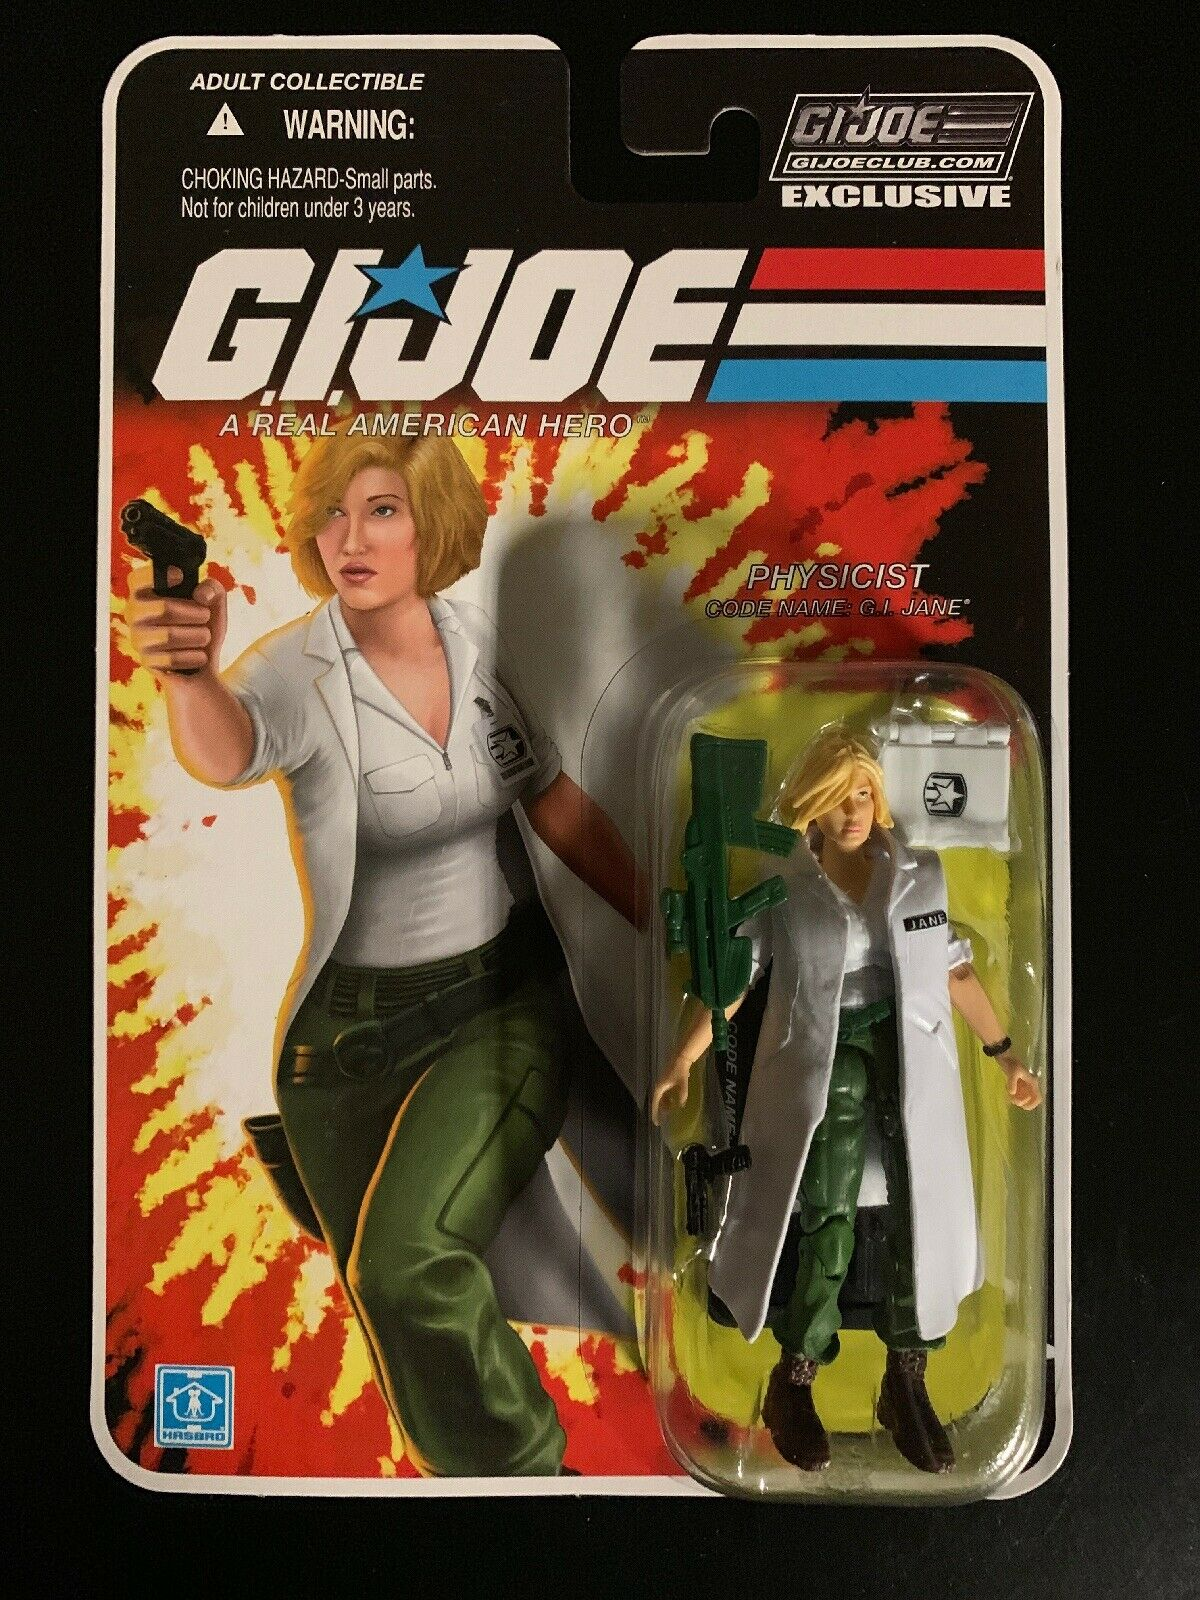 GI JOE FSS 5.0 13 G.I. Jane GIJOE Physicist MISP